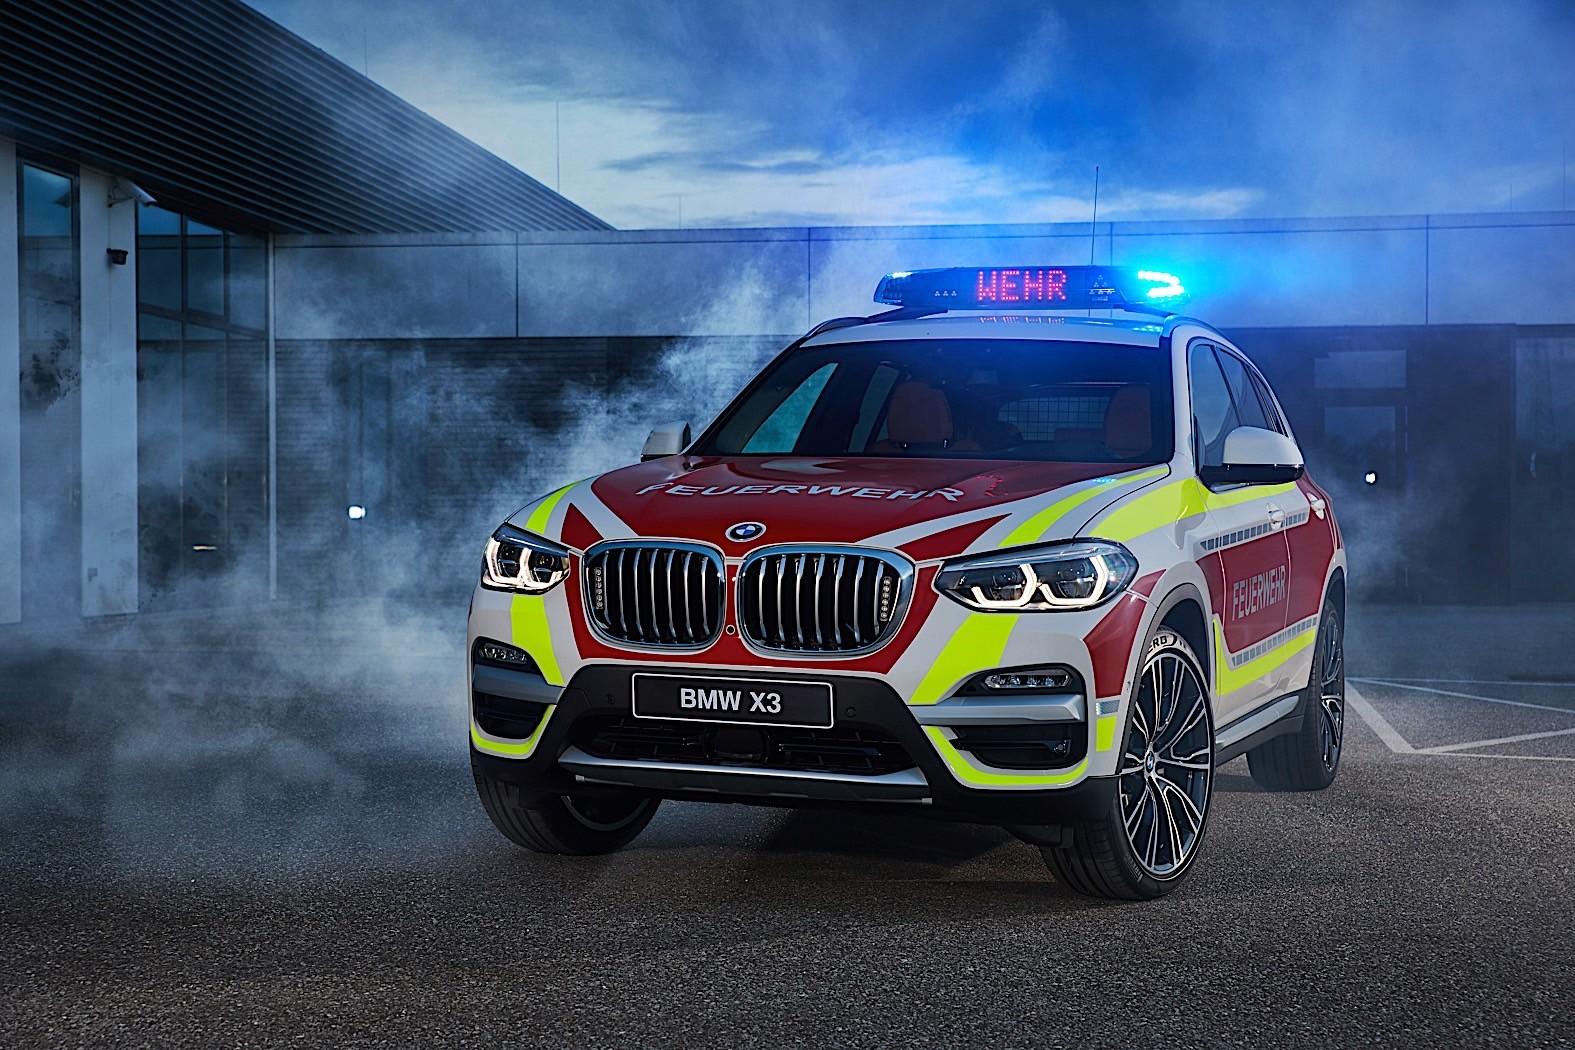 Halcore Group Recalls a Number of Horton Ambulances - autoevolution